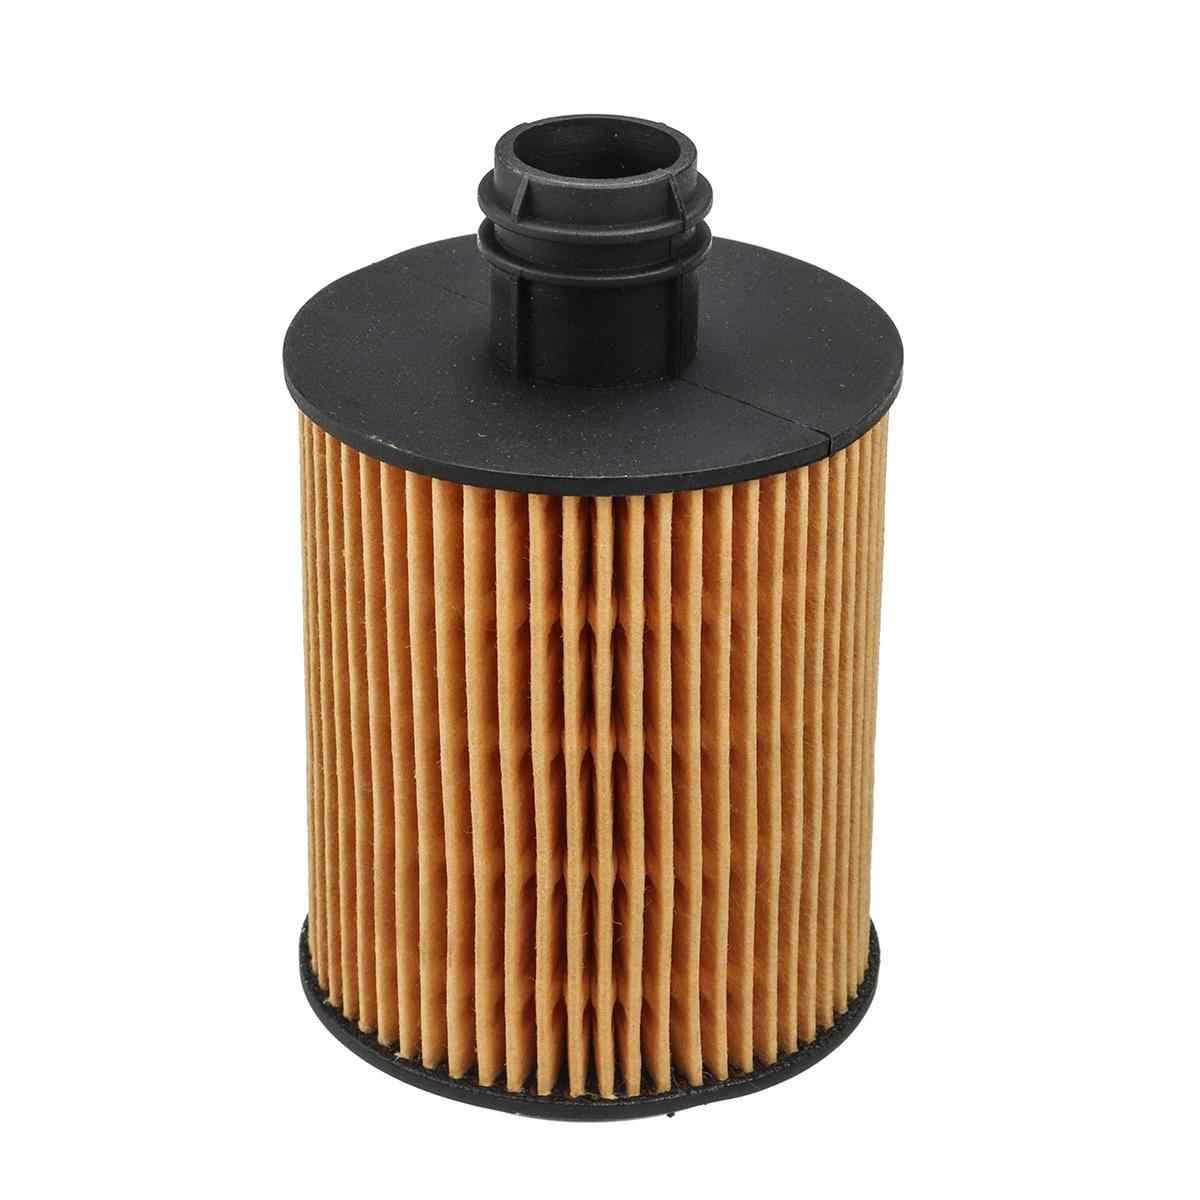 09 Astra 2.0 CDTi Oil,Fuel,Pollen /& Air Filter Service Kit